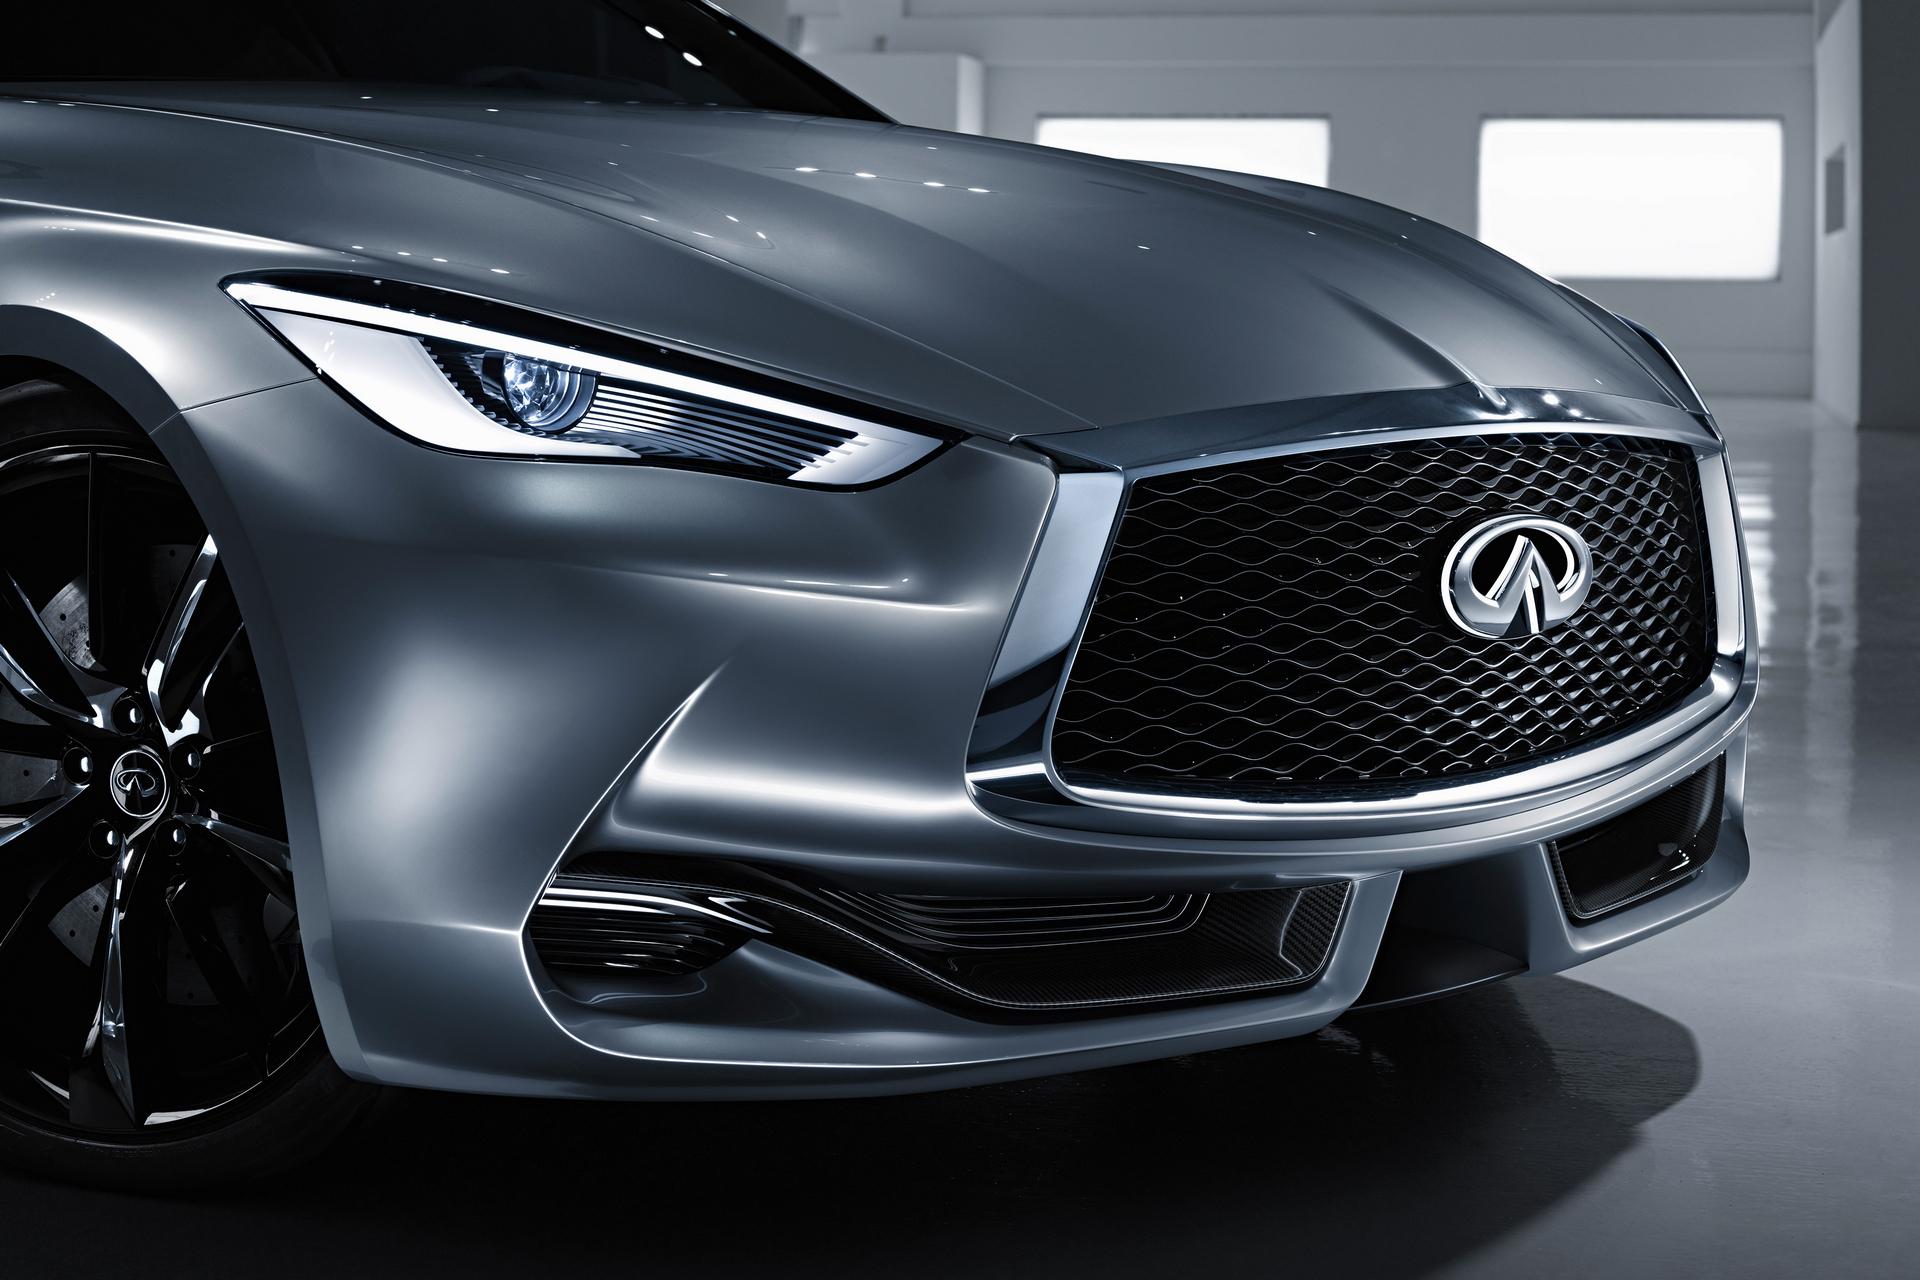 Infiniti Q60 Concept © Nissan Motor Co., Ltd.